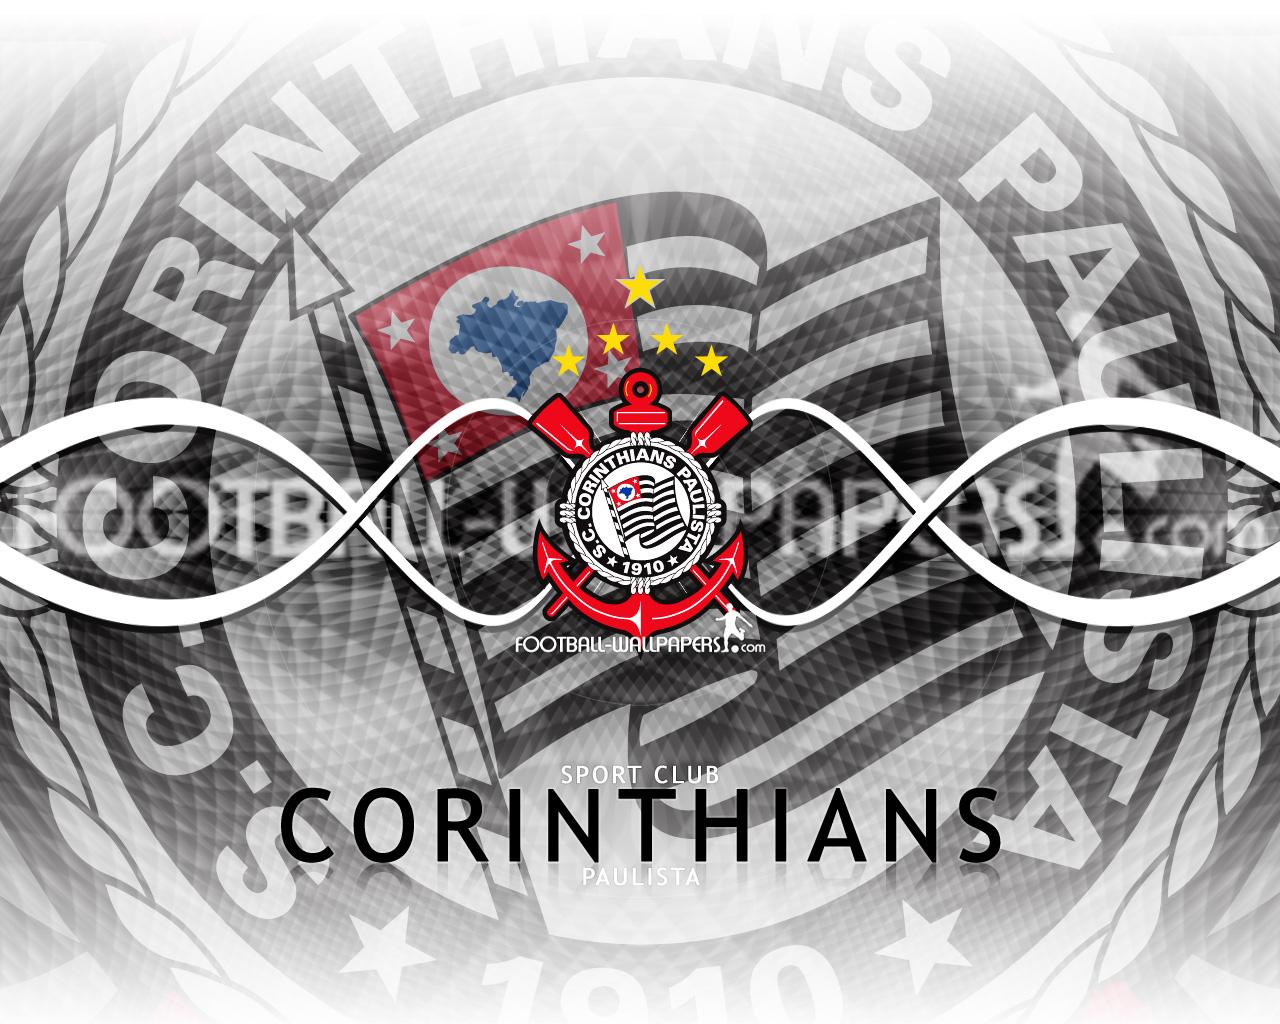 Sport Club Corinthians